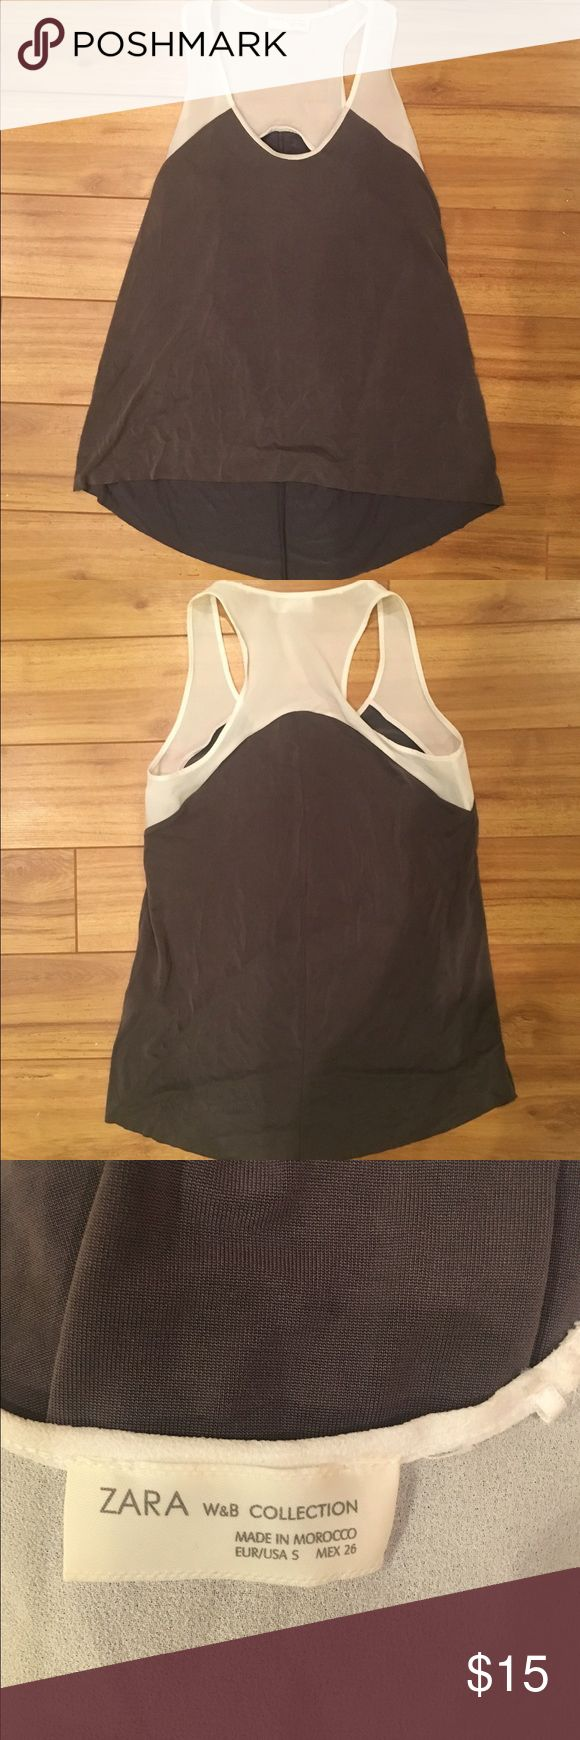 Zara Shirt - Size S No rips or stains. Zara Tops